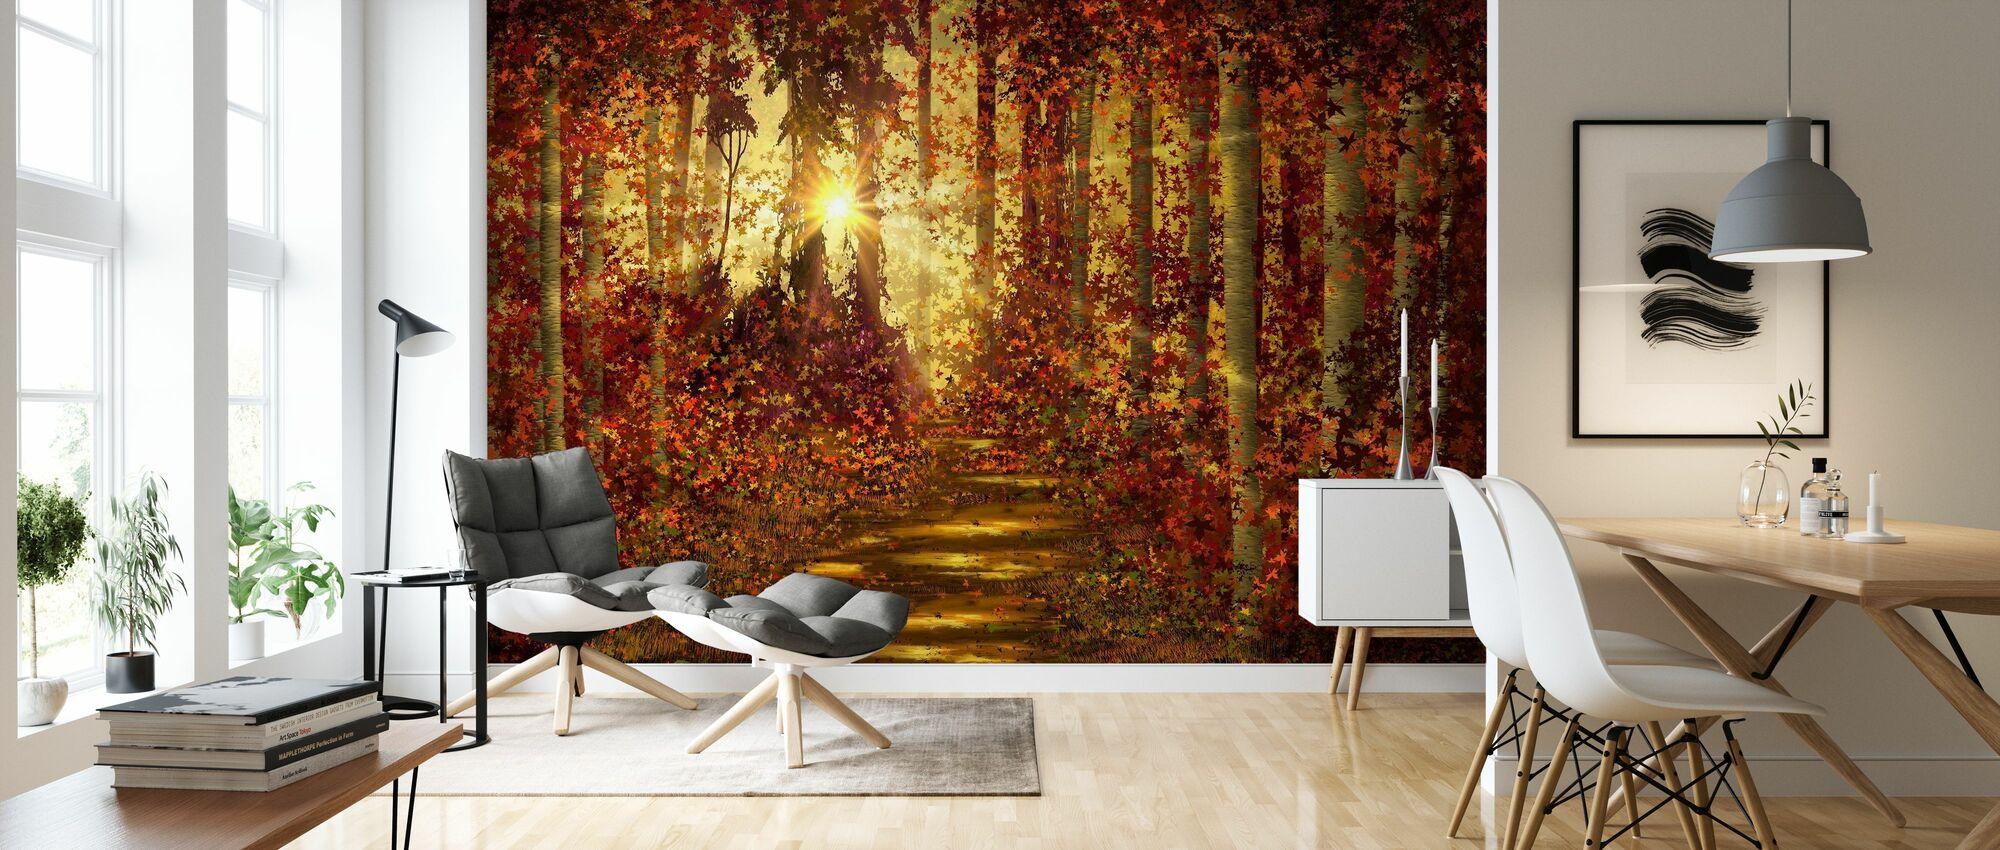 Forest Trails - Wallpaper - Living Room